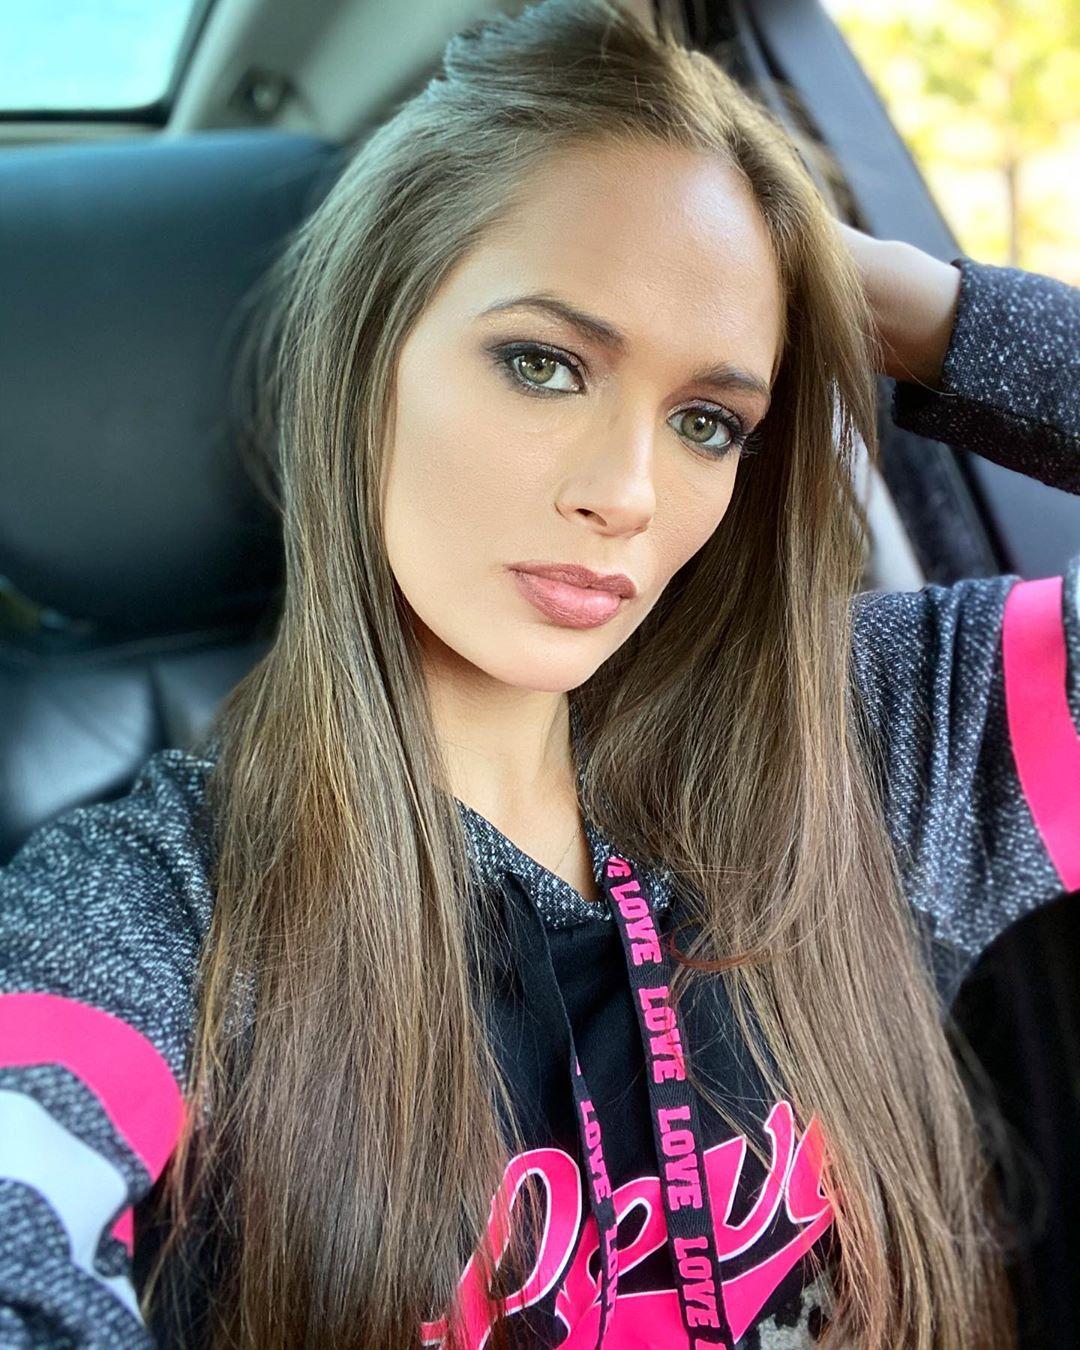 Jessica-Dykstra-Wallpapers-Insta-Fit-Bio-1